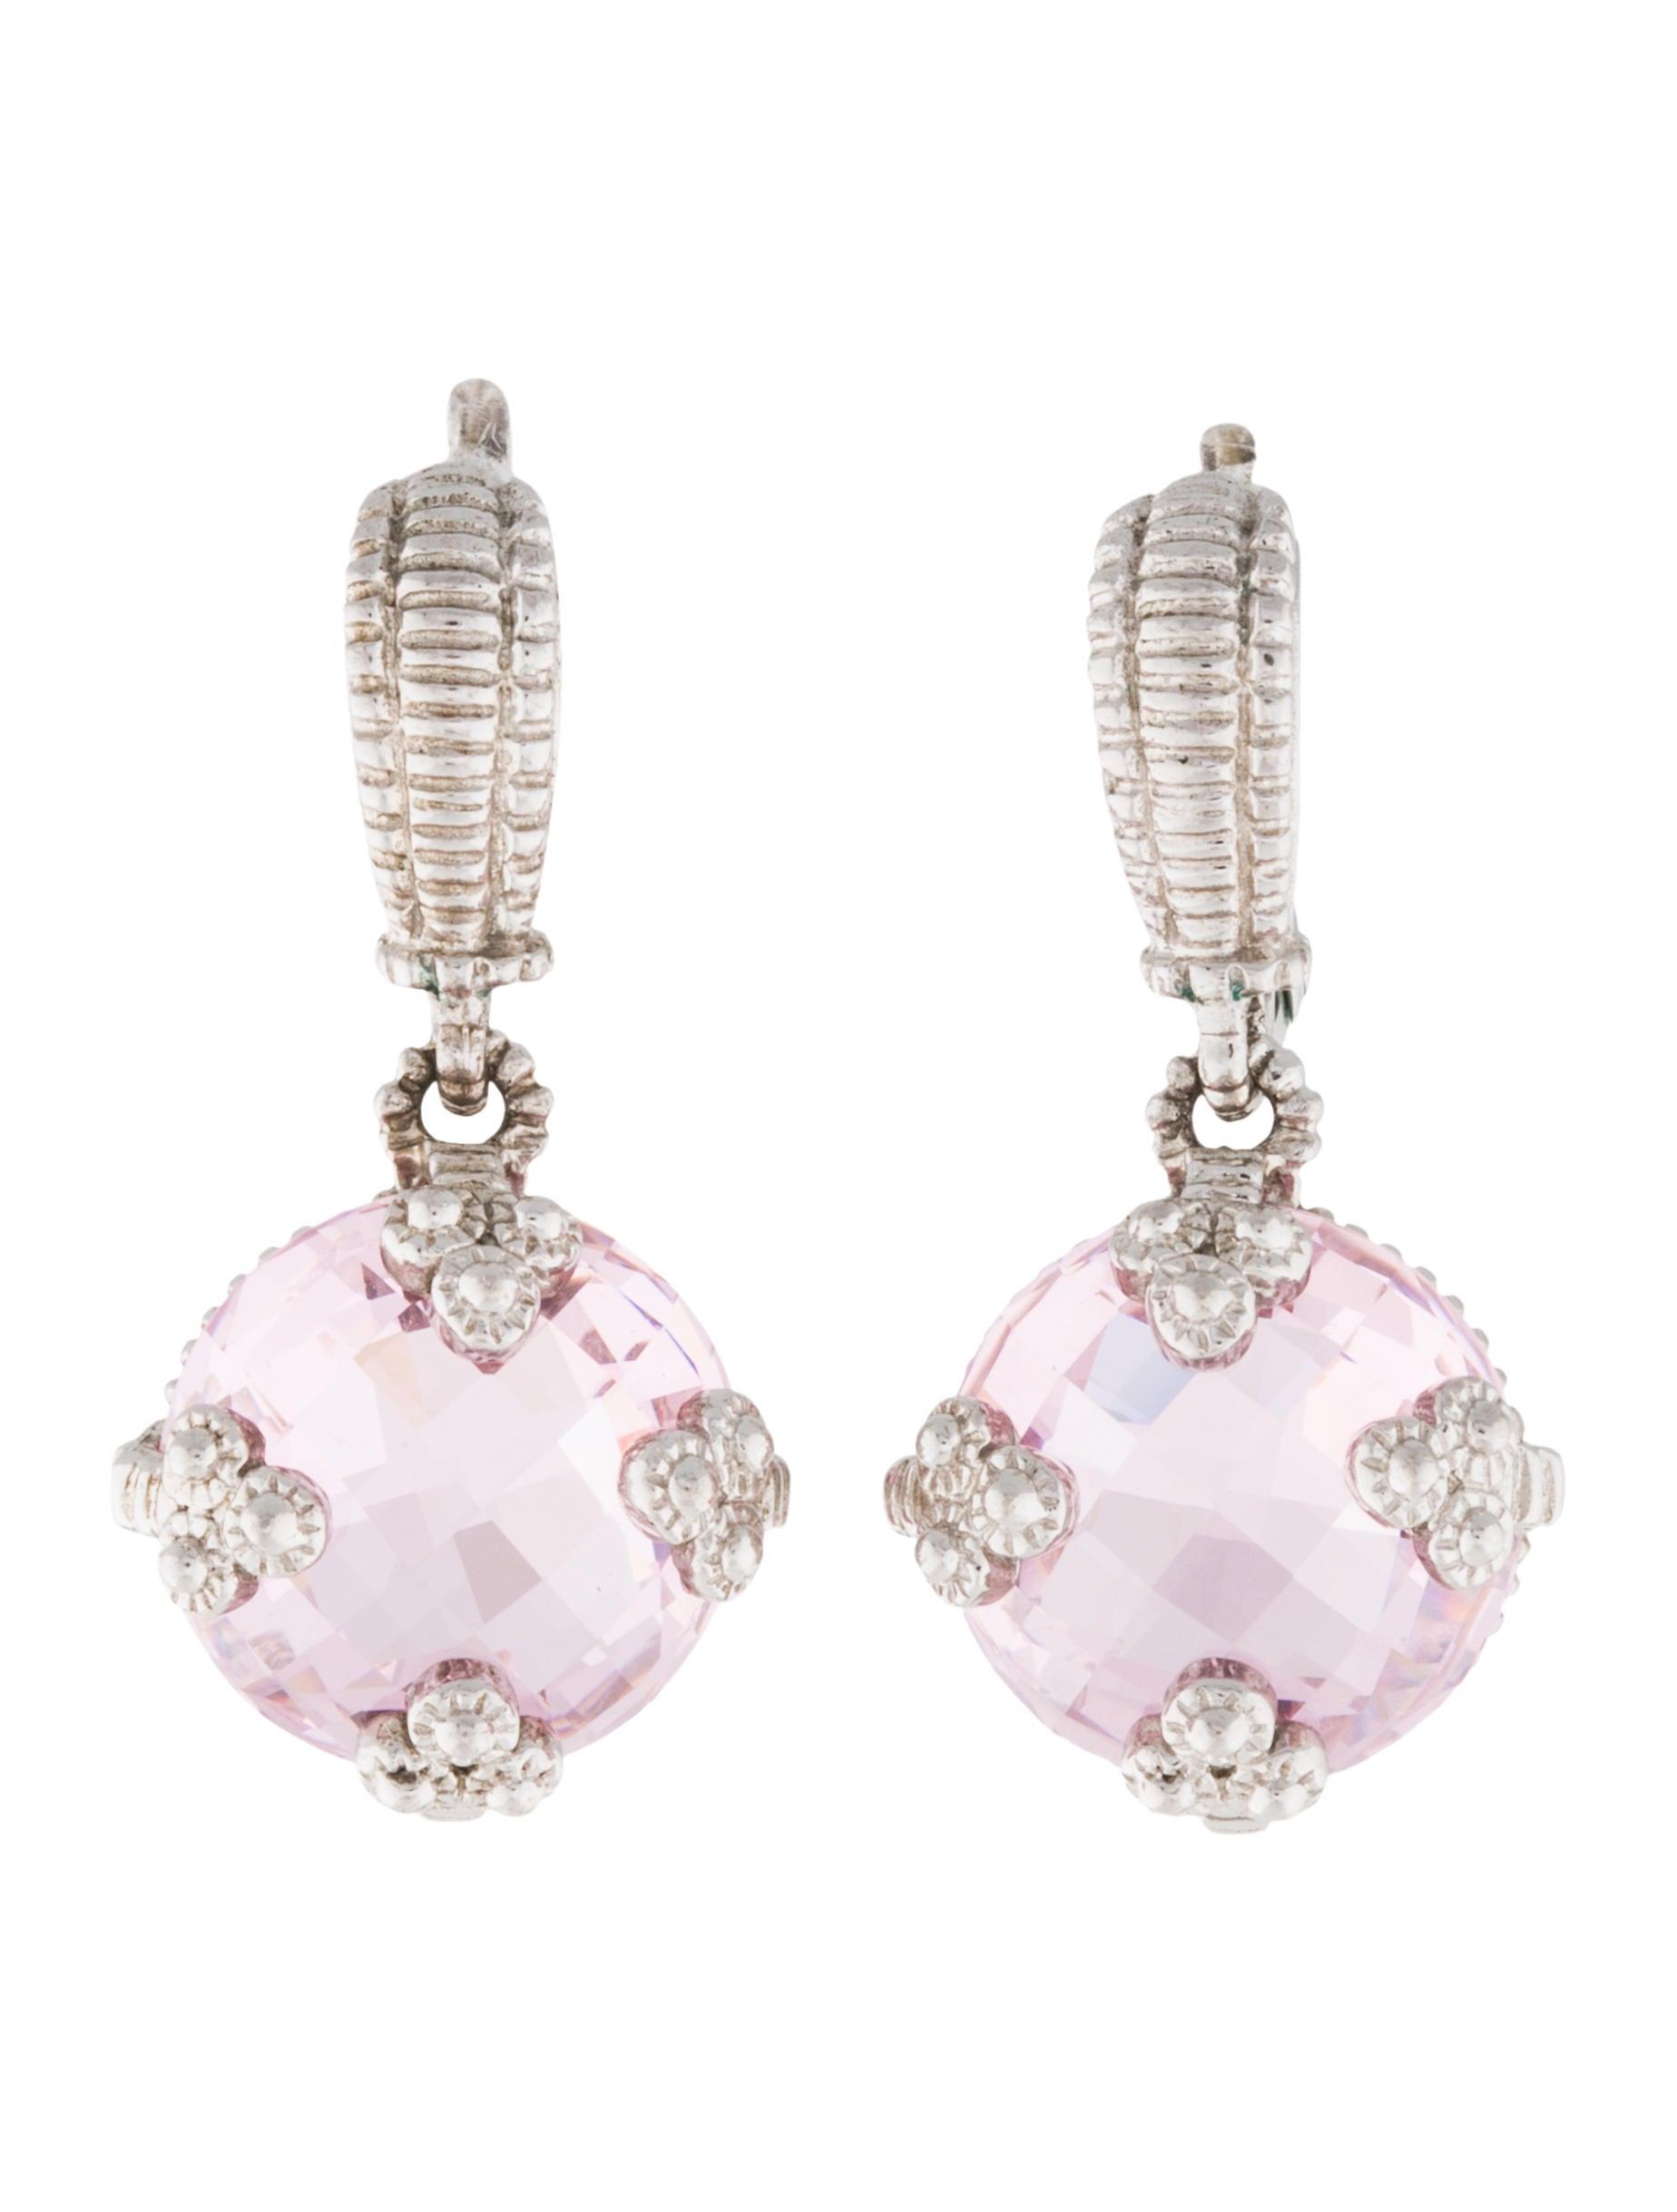 Judith Ripka Pink Crystal Drop Earrings  Earrings. Cartier Mens Bands. Sapphire Diamond Bracelet. Circular Necklace. Black Stone Earrings. Band Diamond. Art Deco Antique Engagement Rings. Orange Rings. Engagement Rings Online